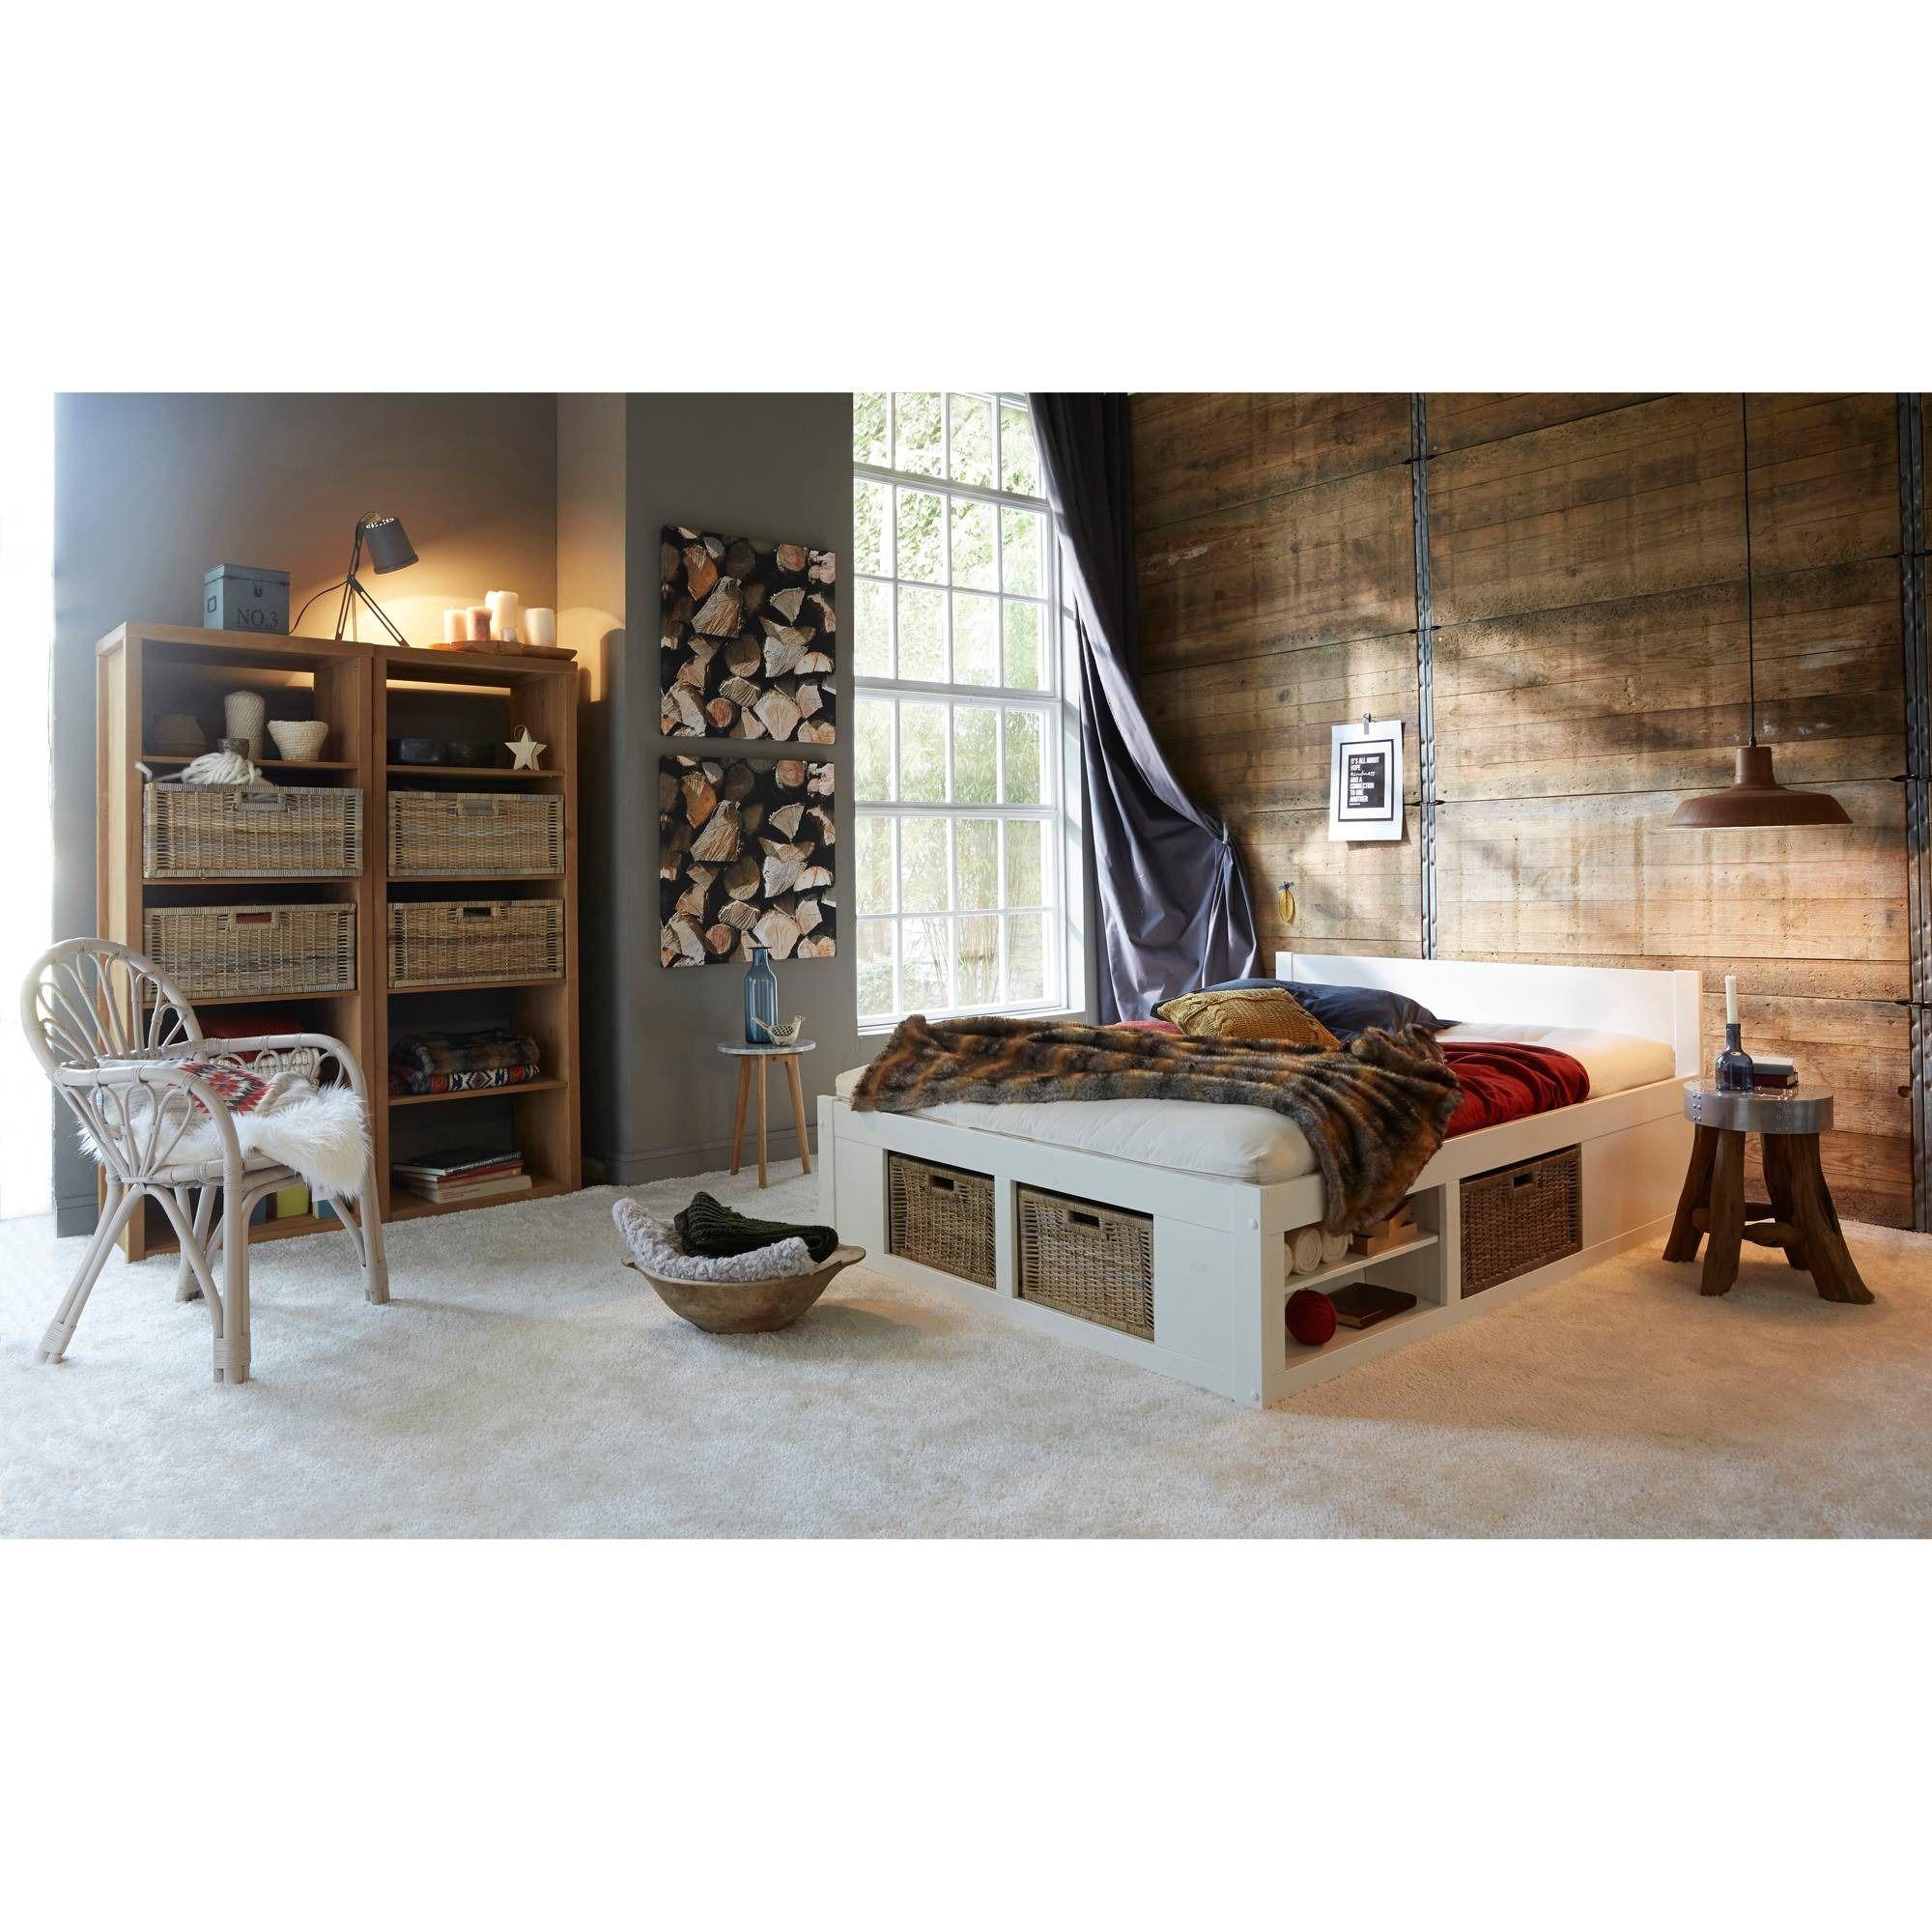 lit 2 personnes multi rangements helsinki en pin massif avec sommier et paniers int gr s 3. Black Bedroom Furniture Sets. Home Design Ideas